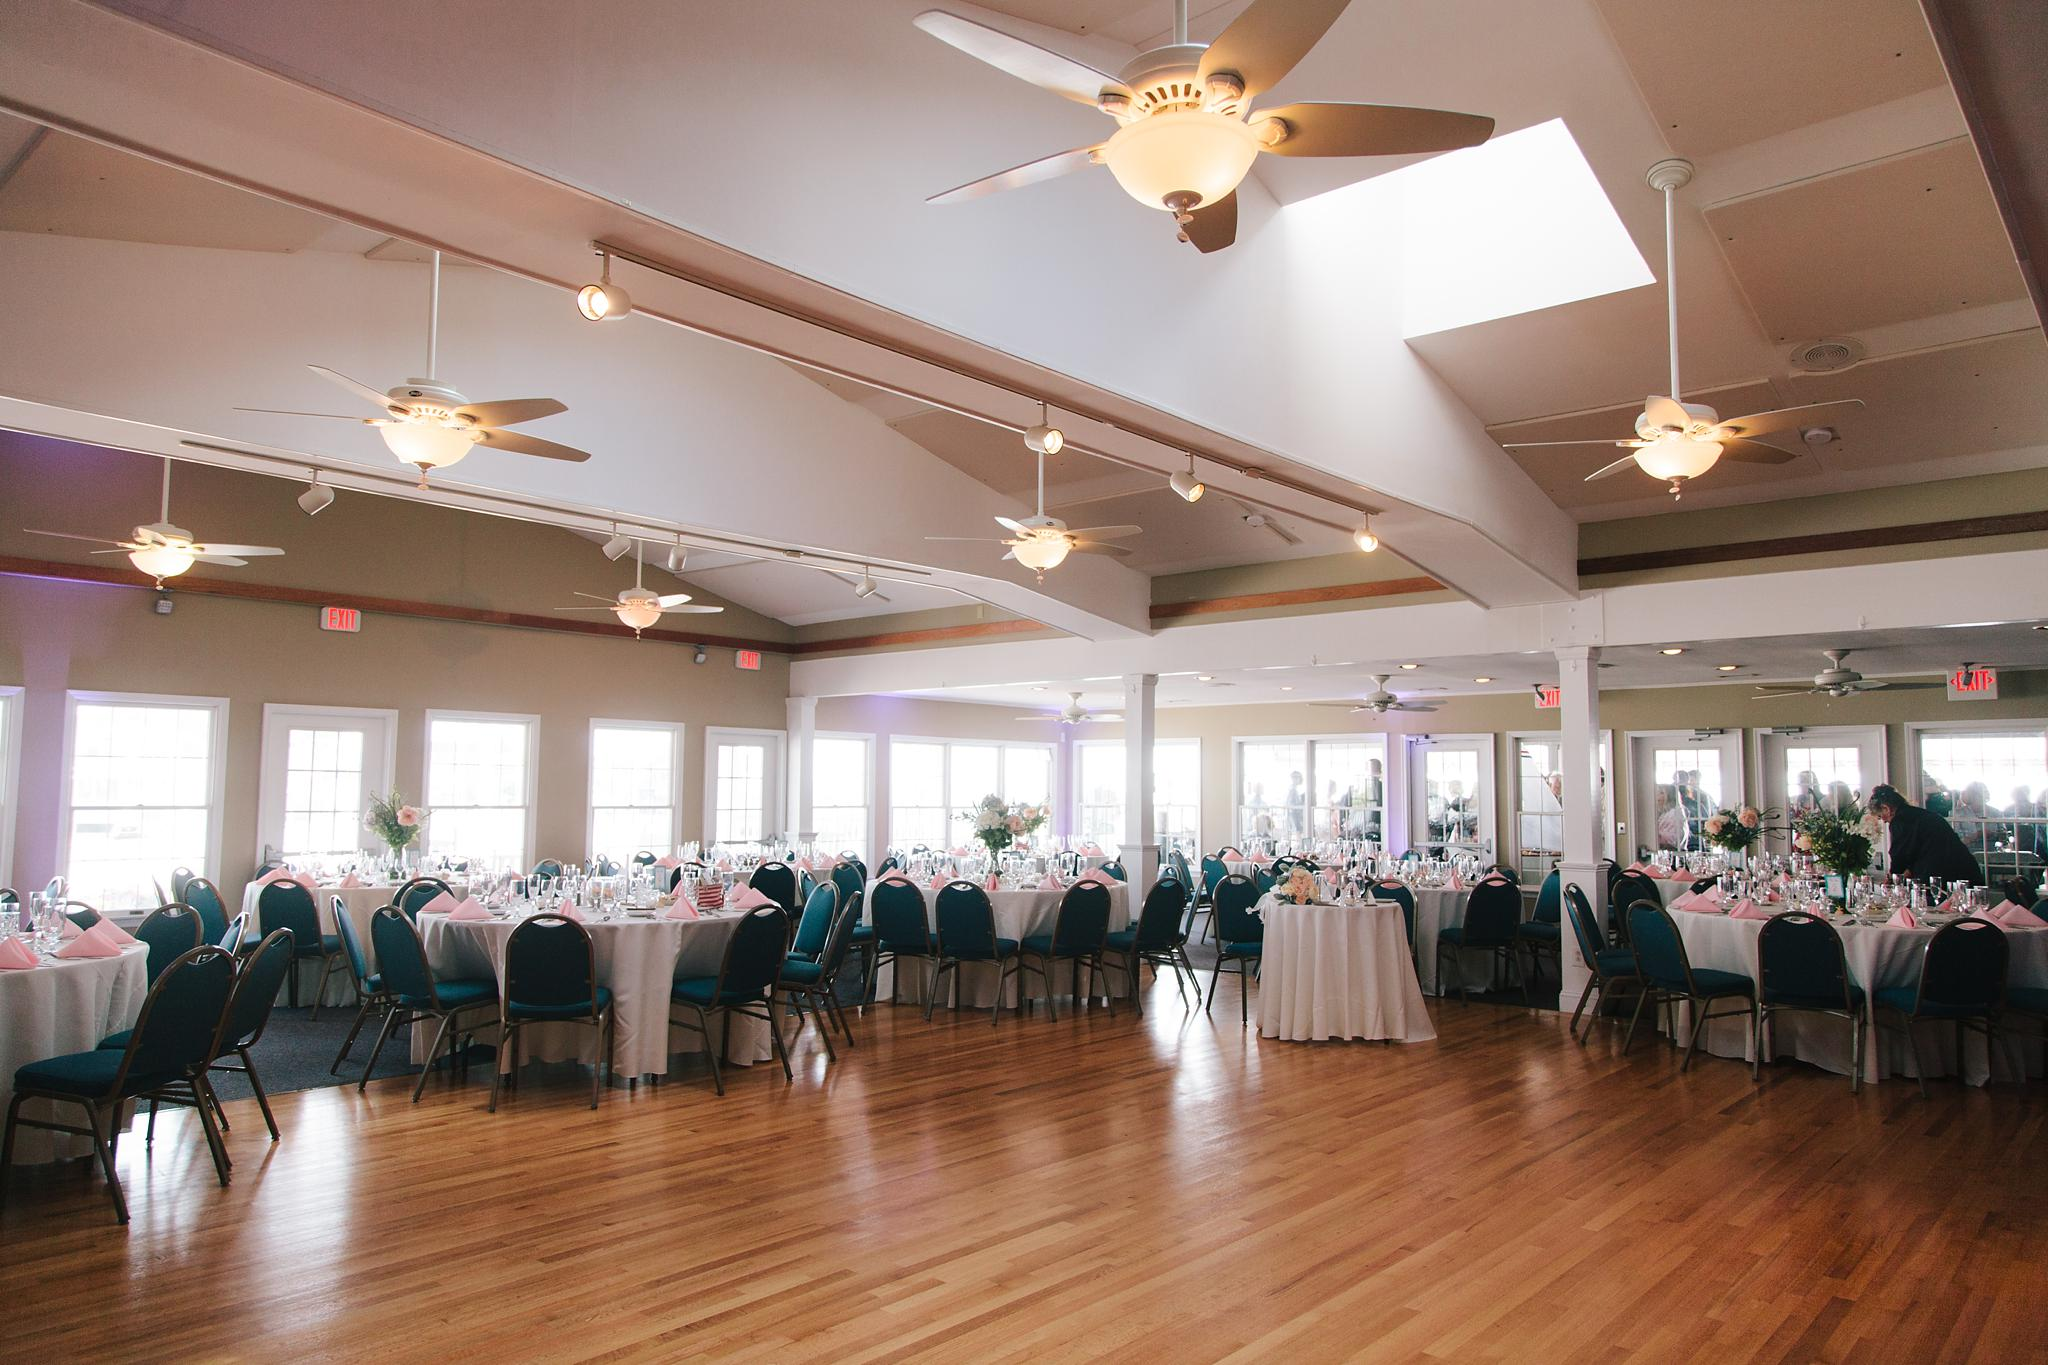 brant_beach_yacht_club_wedding_long_beach_island_nj_wedding_photographer_650.jpg